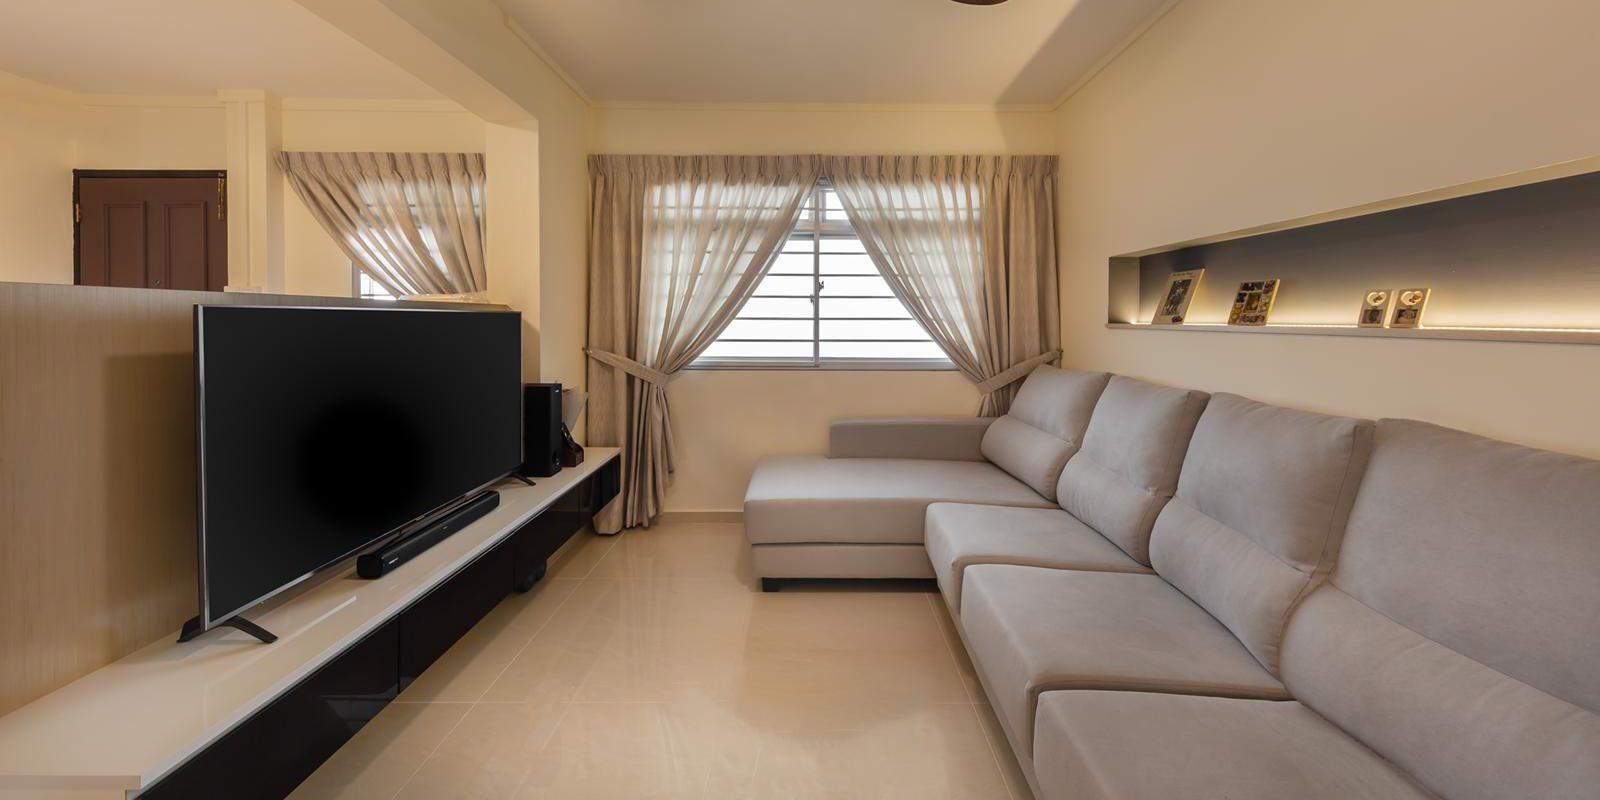 Clean and Spacious Modern Home Interior Design